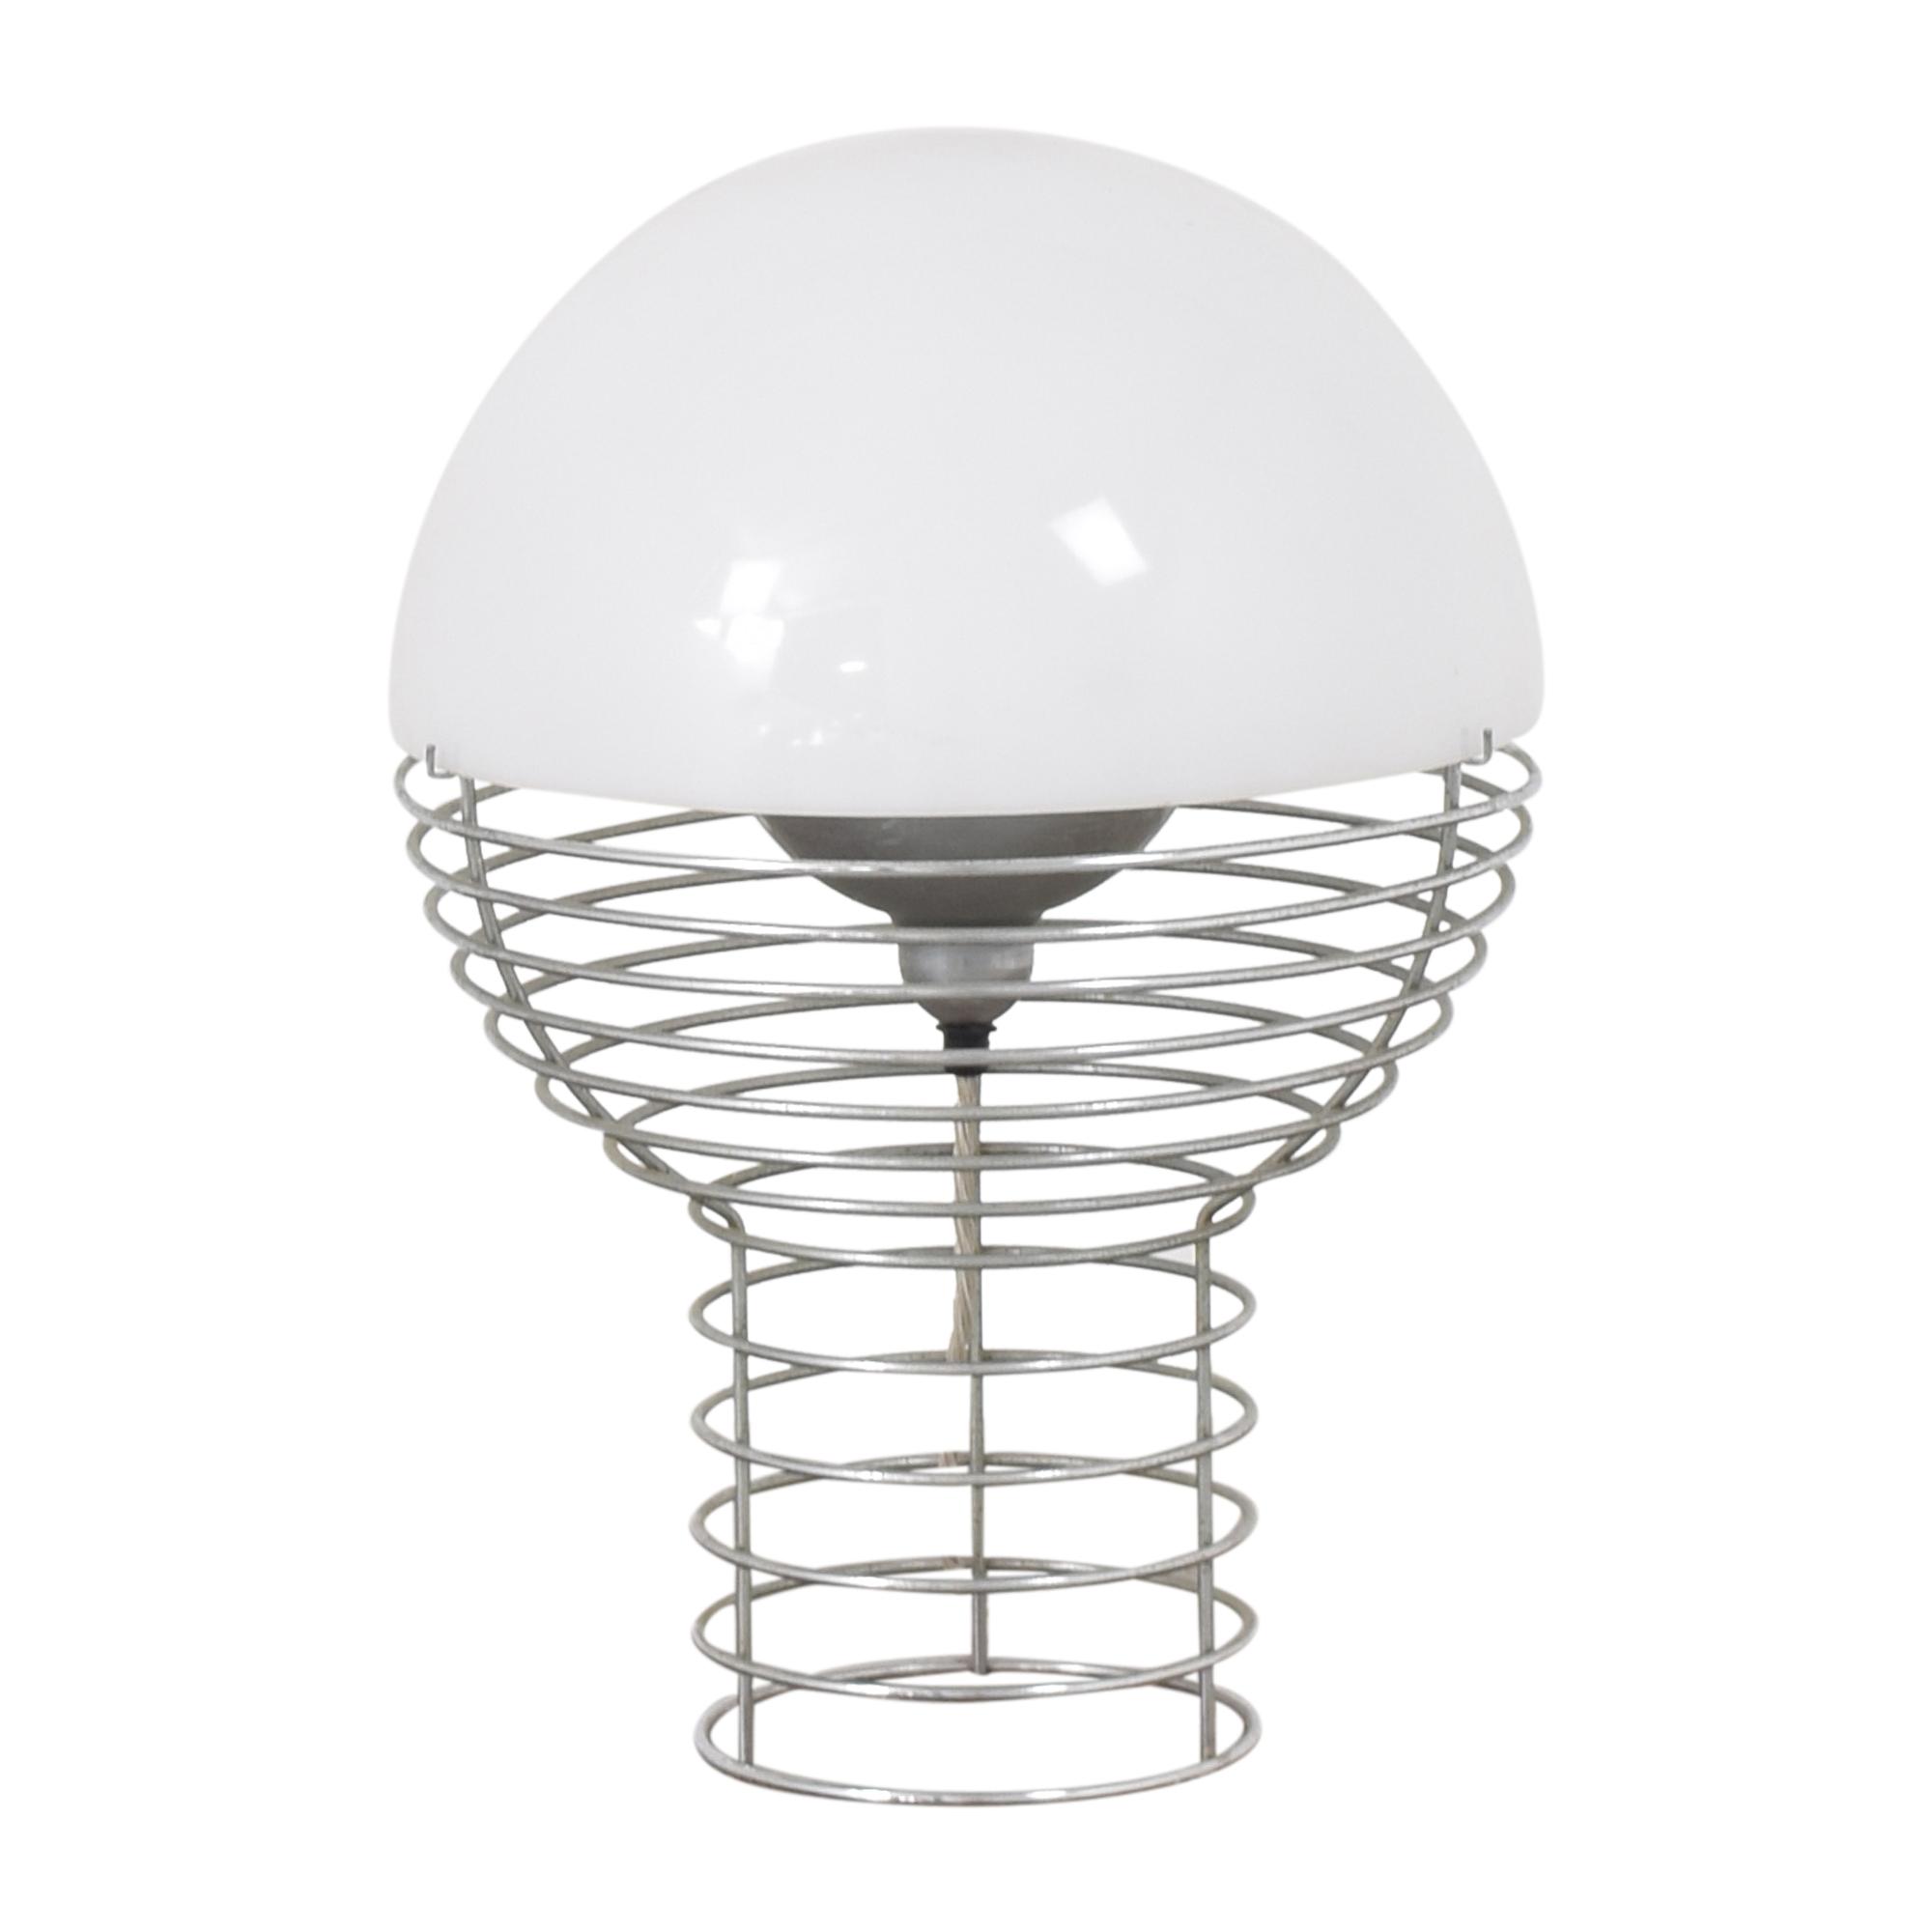 Verpan Verpan Wire Table Lamp used